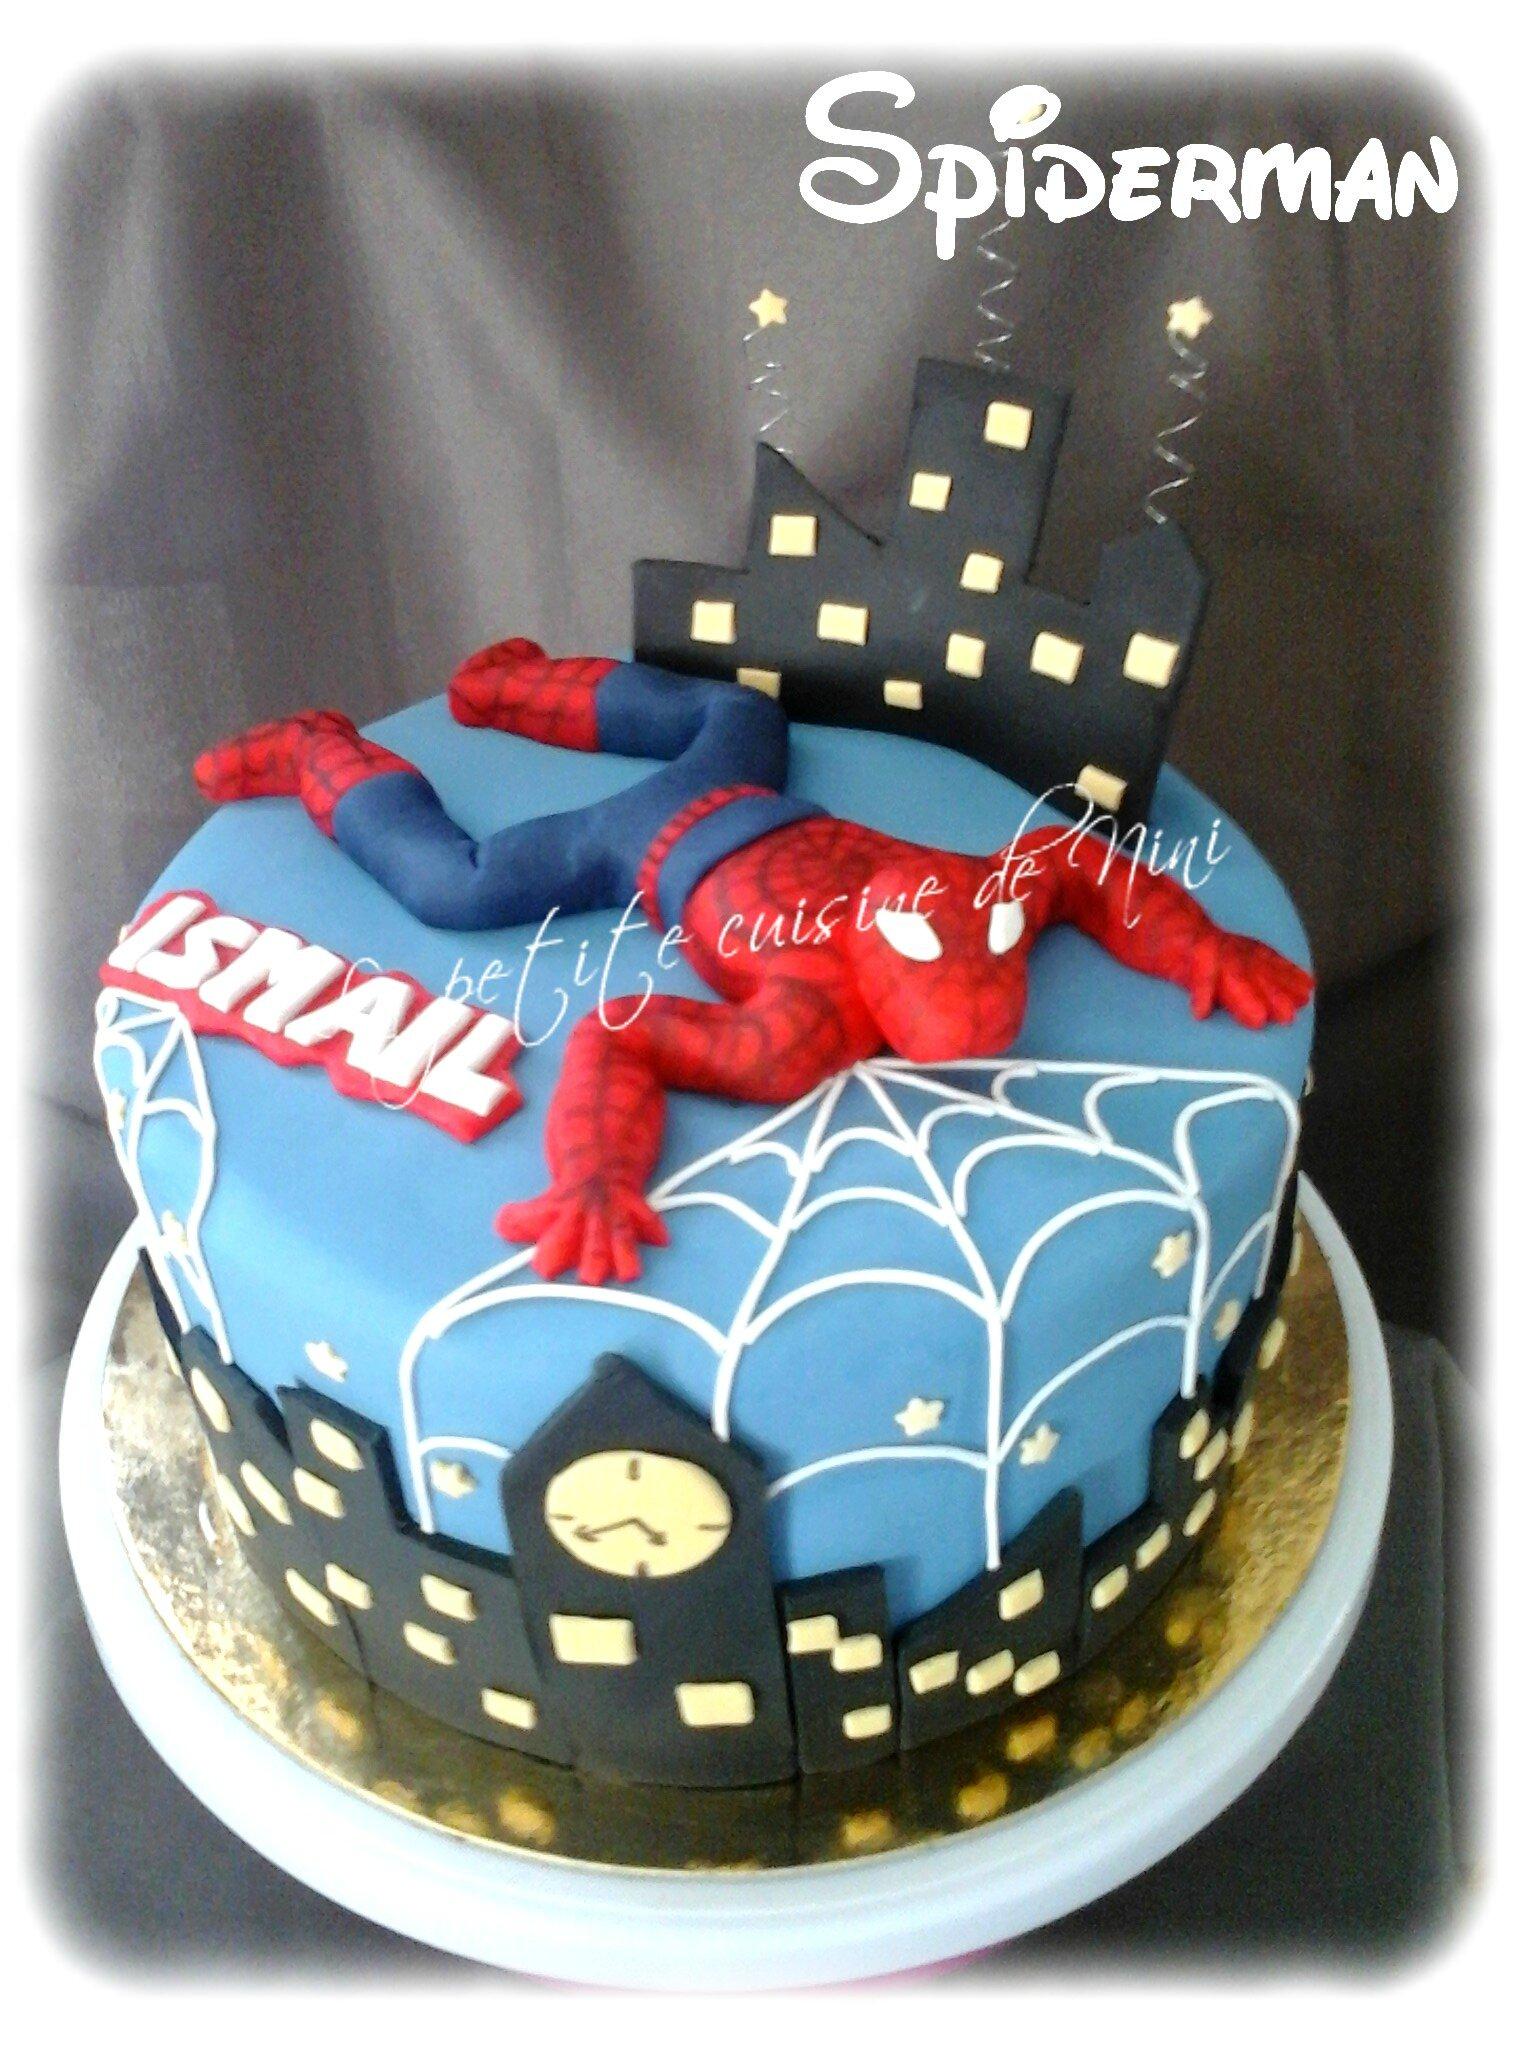 La petite cuisine de nini - Deco anniversaire spiderman ...